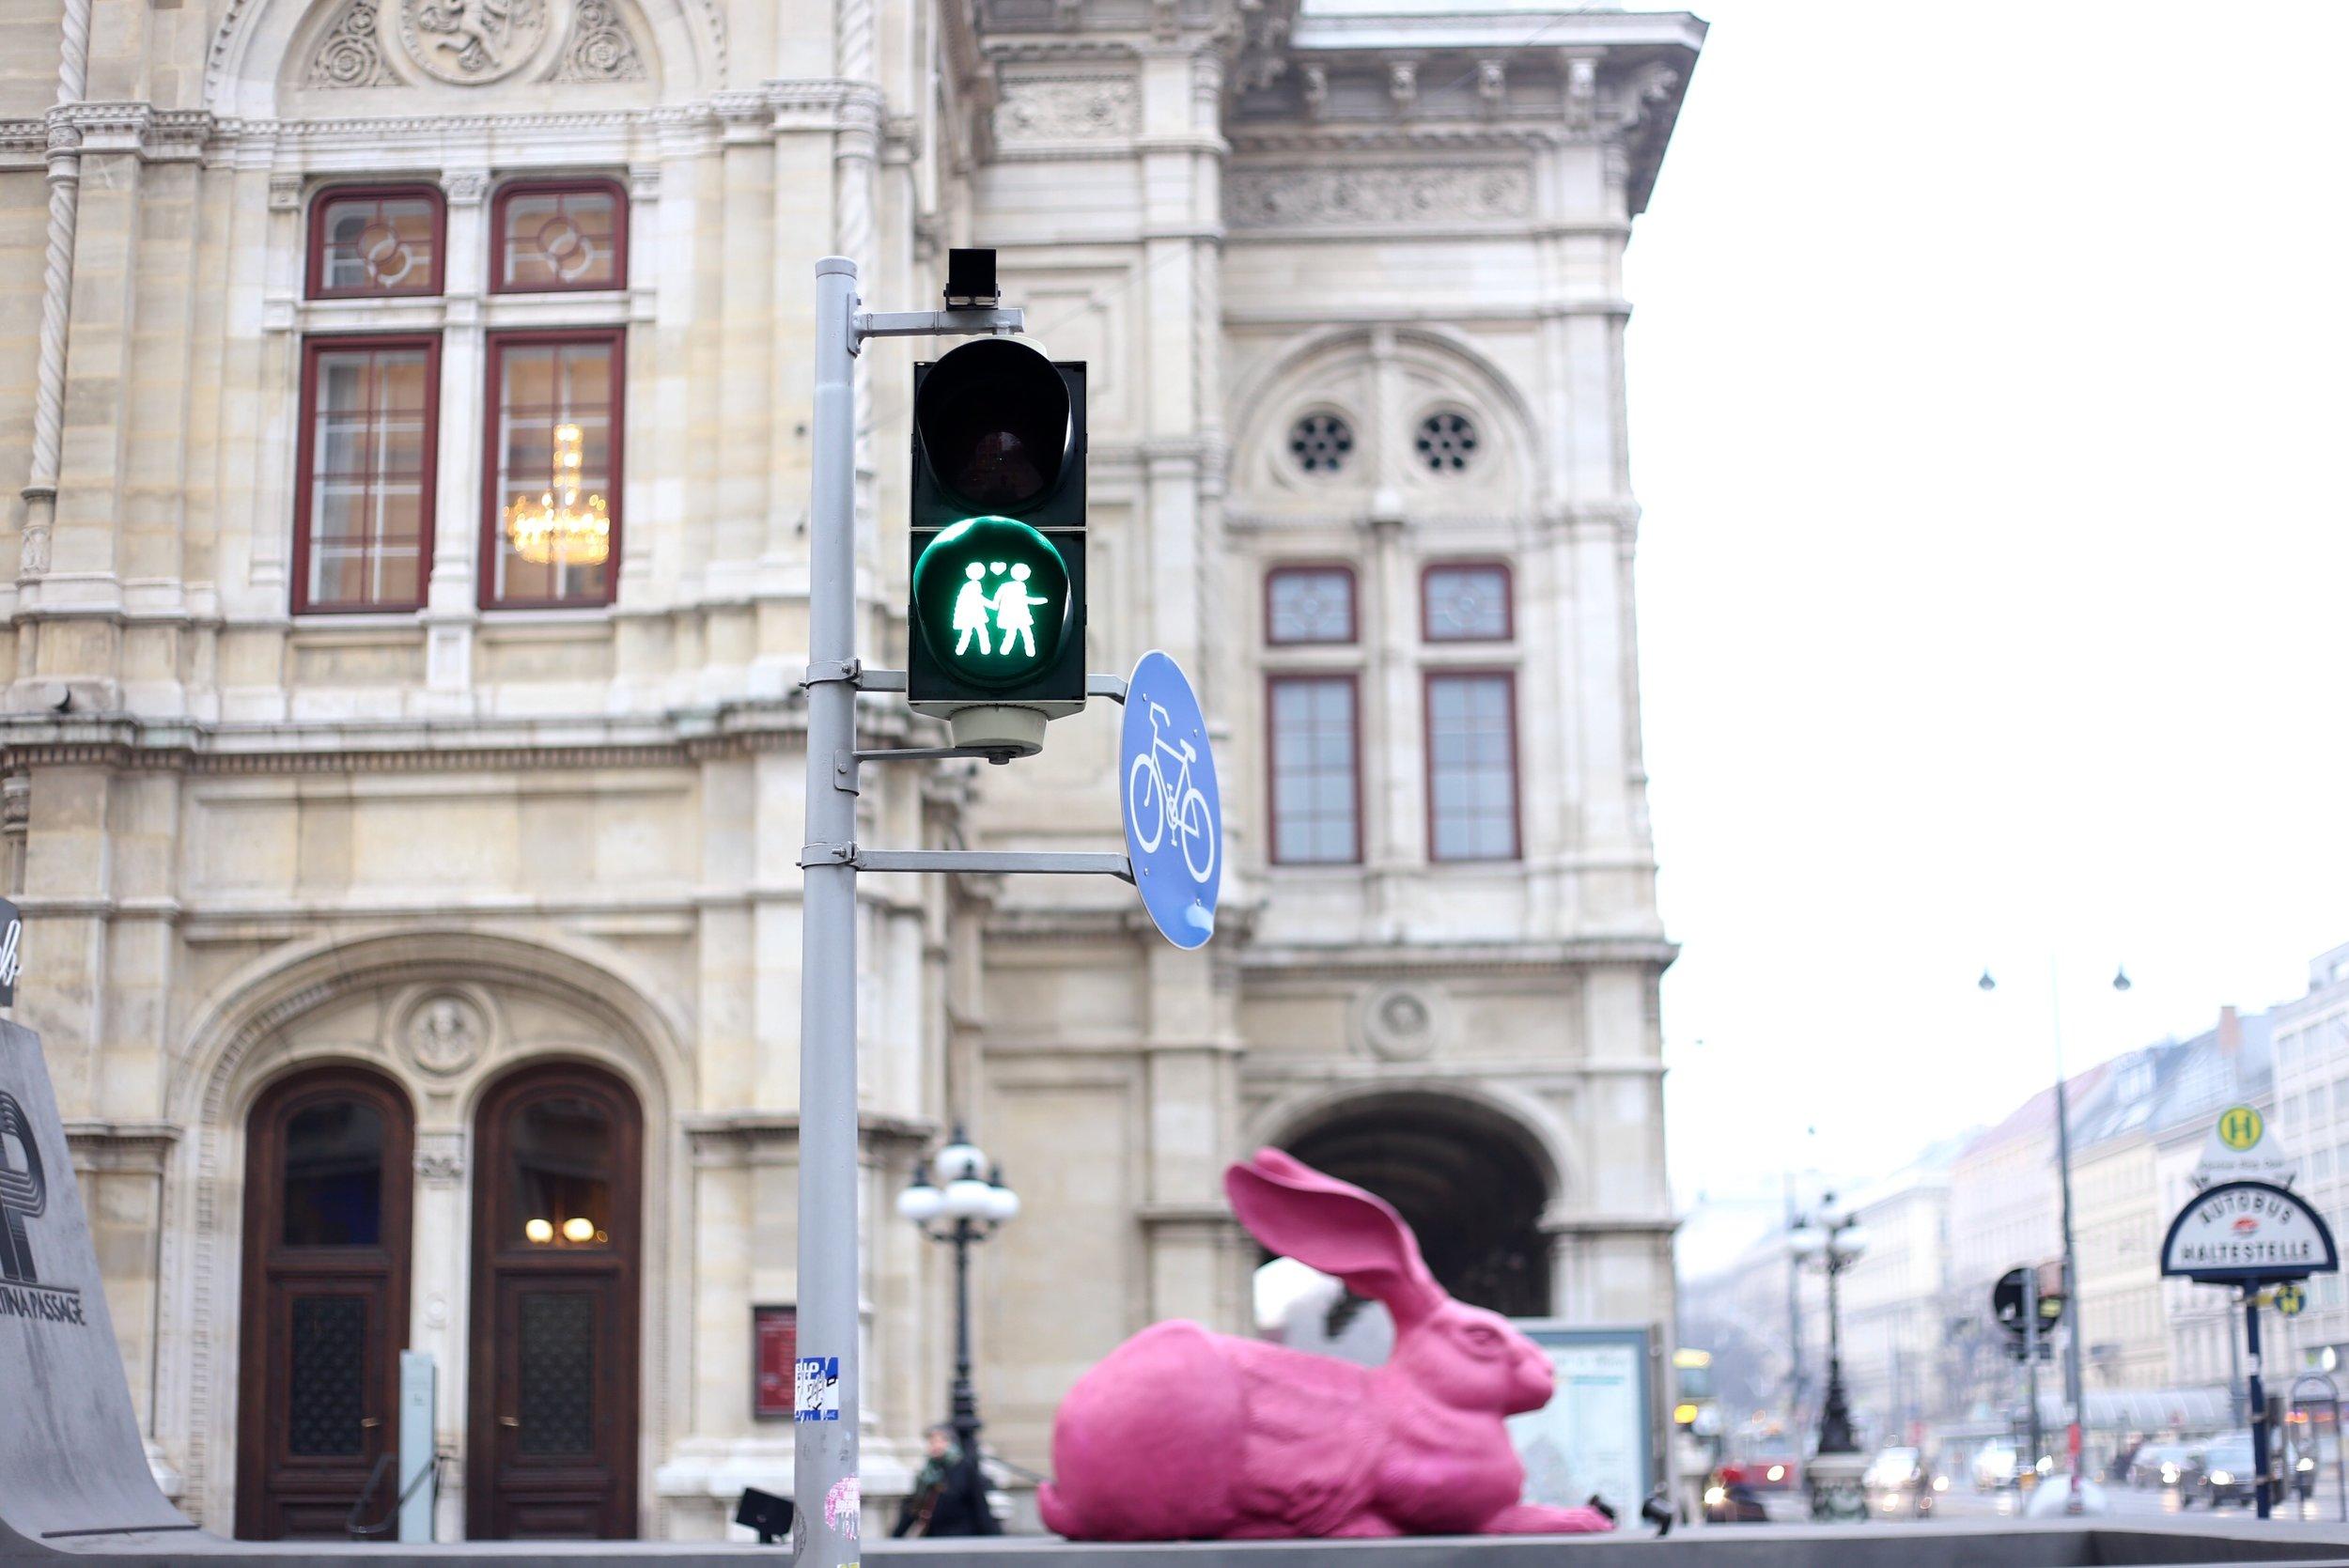 Crosswalk lights with love hearts.